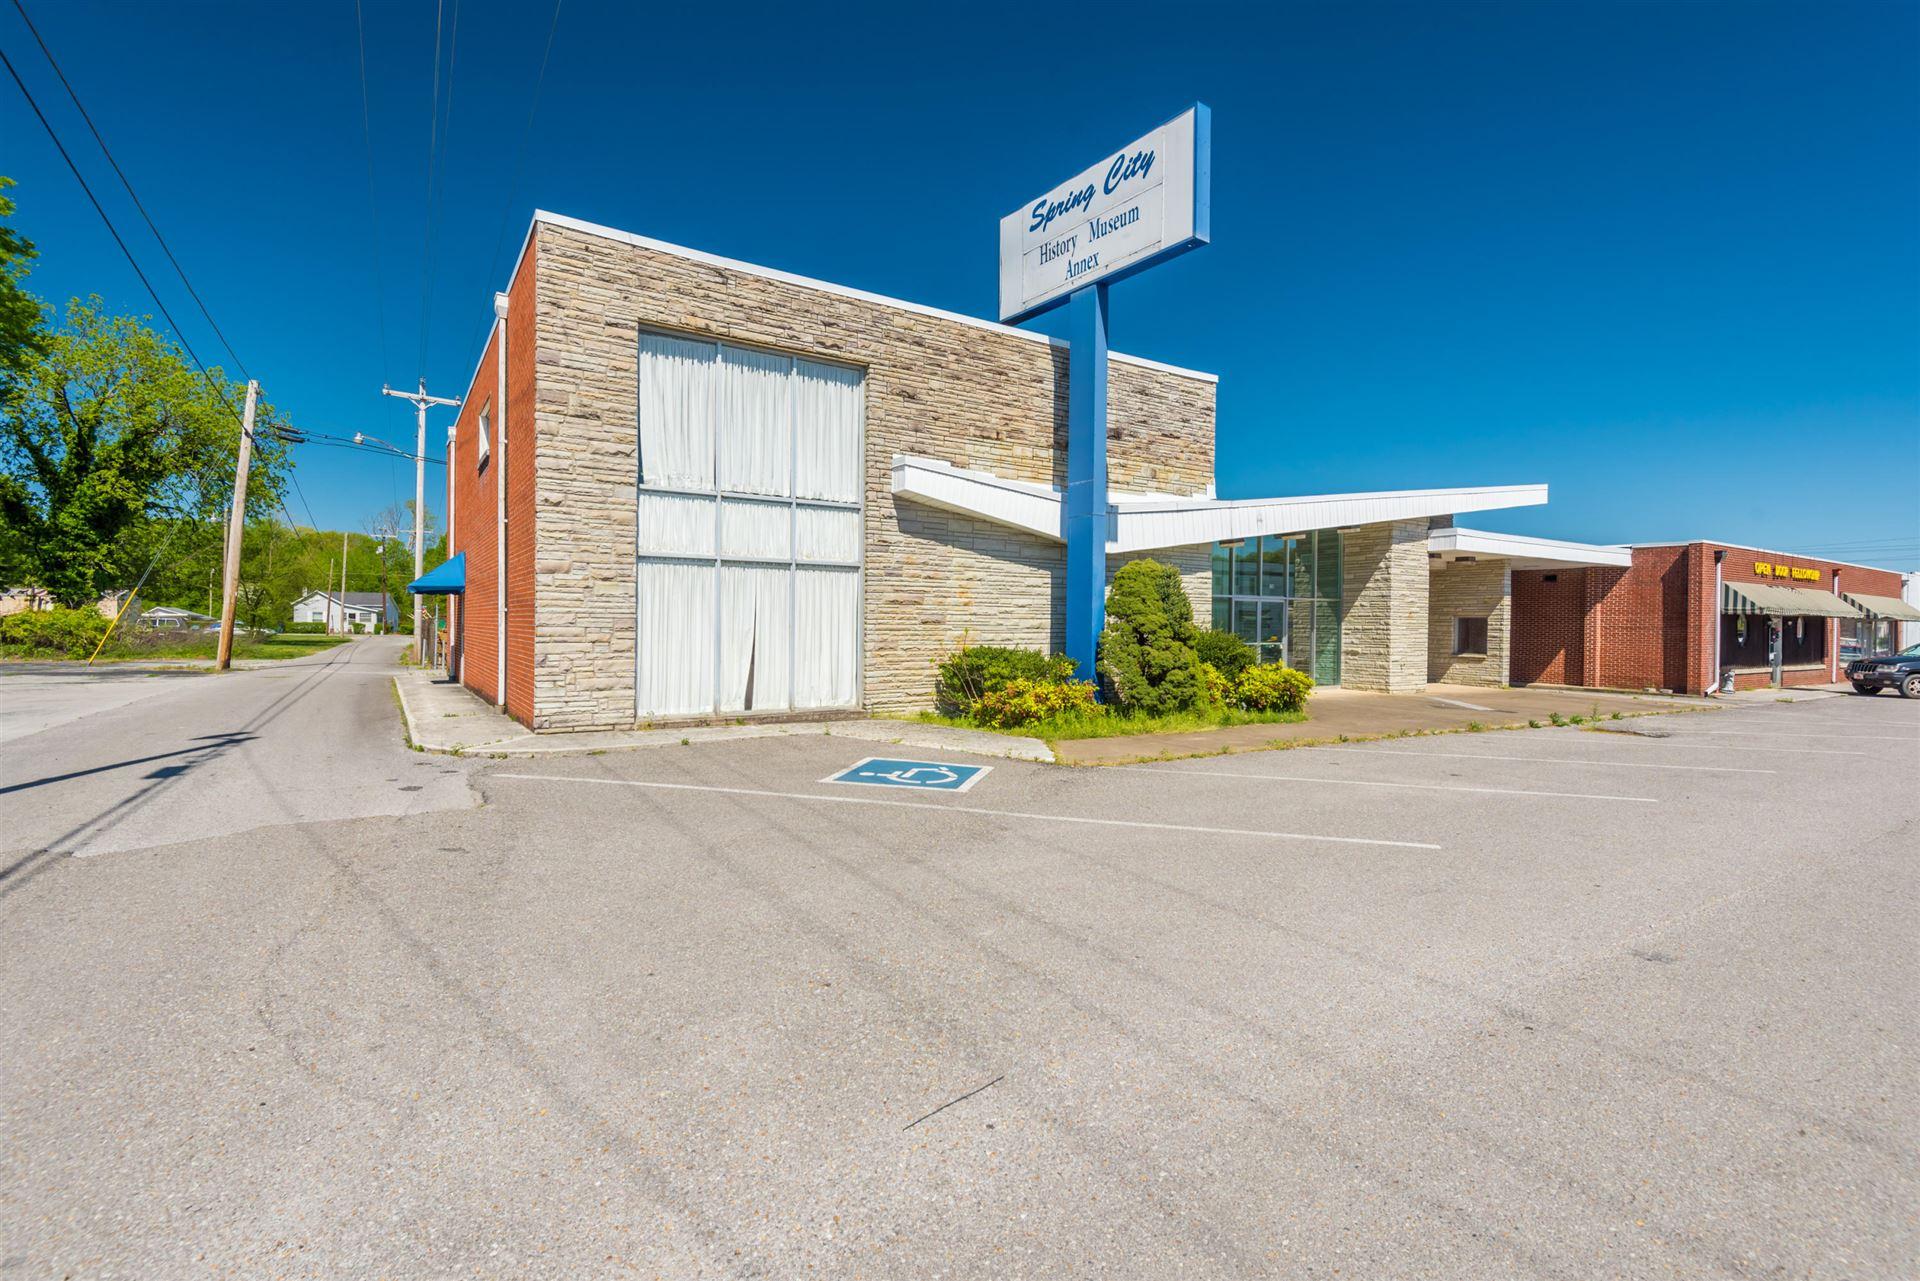 Photo of 150 W Rhea Ave, Spring City, TN 37381 (MLS # 1156671)